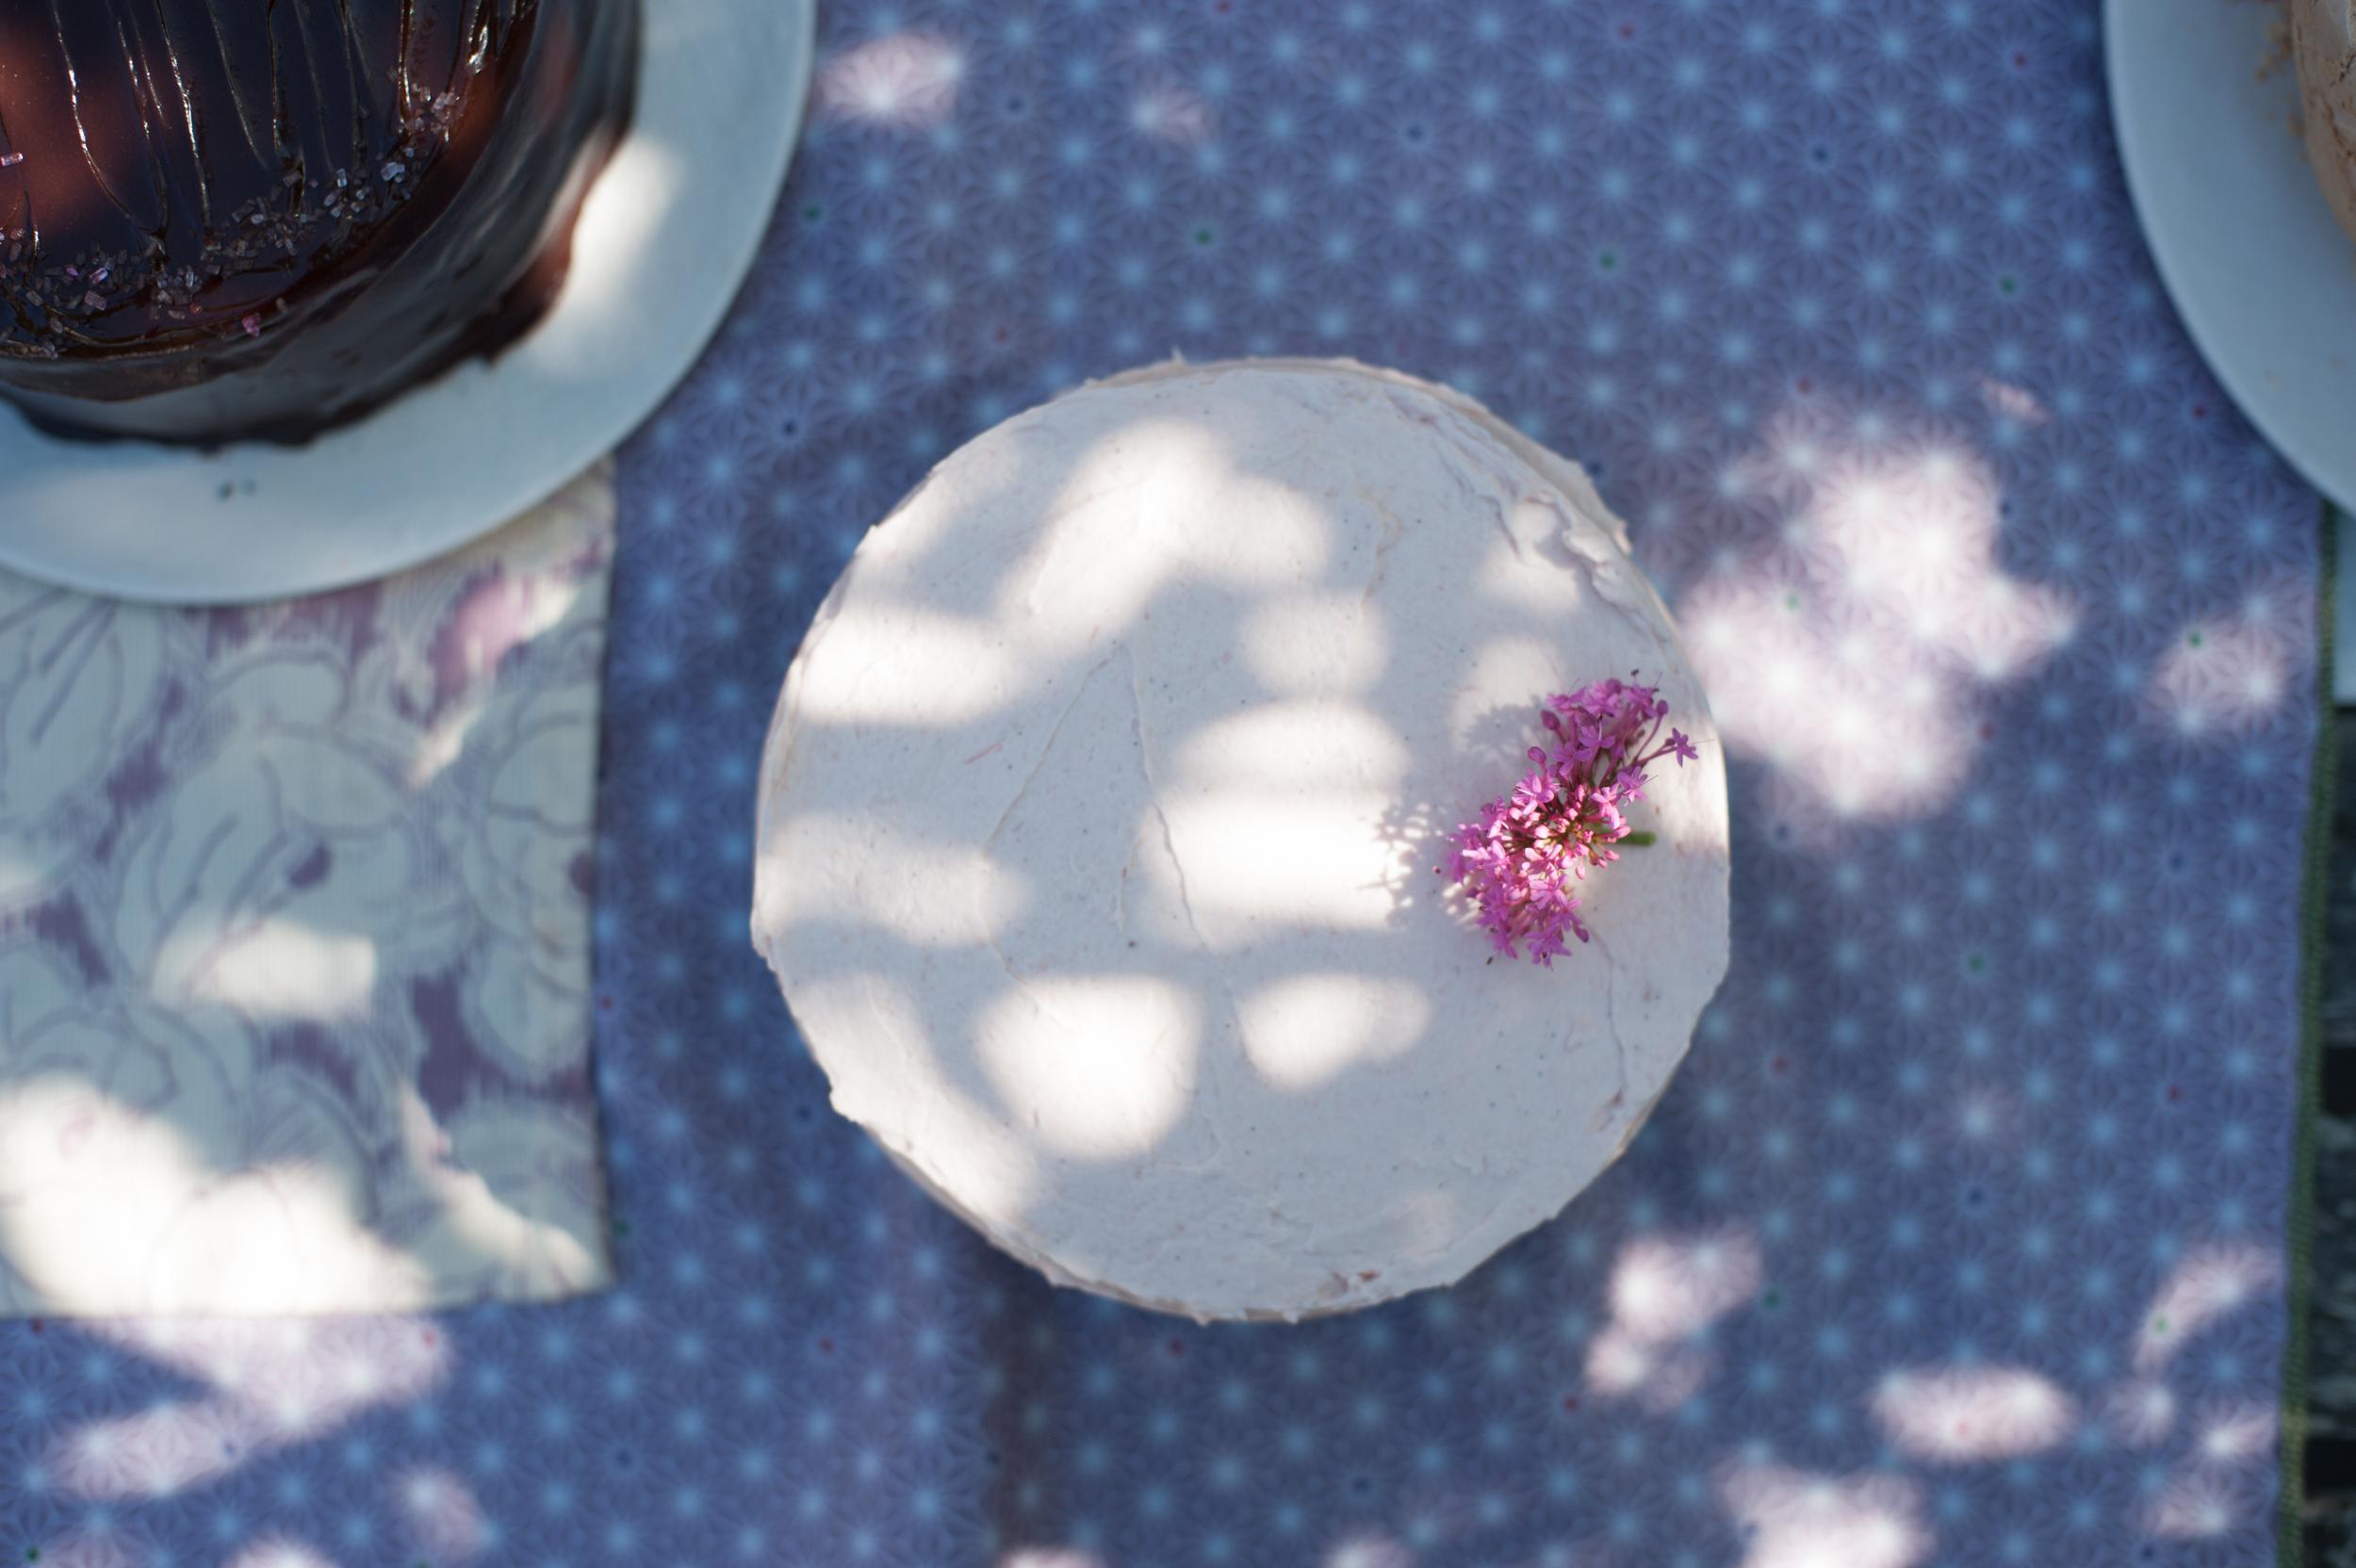 Spring Equinox + Rhubarb Cake!